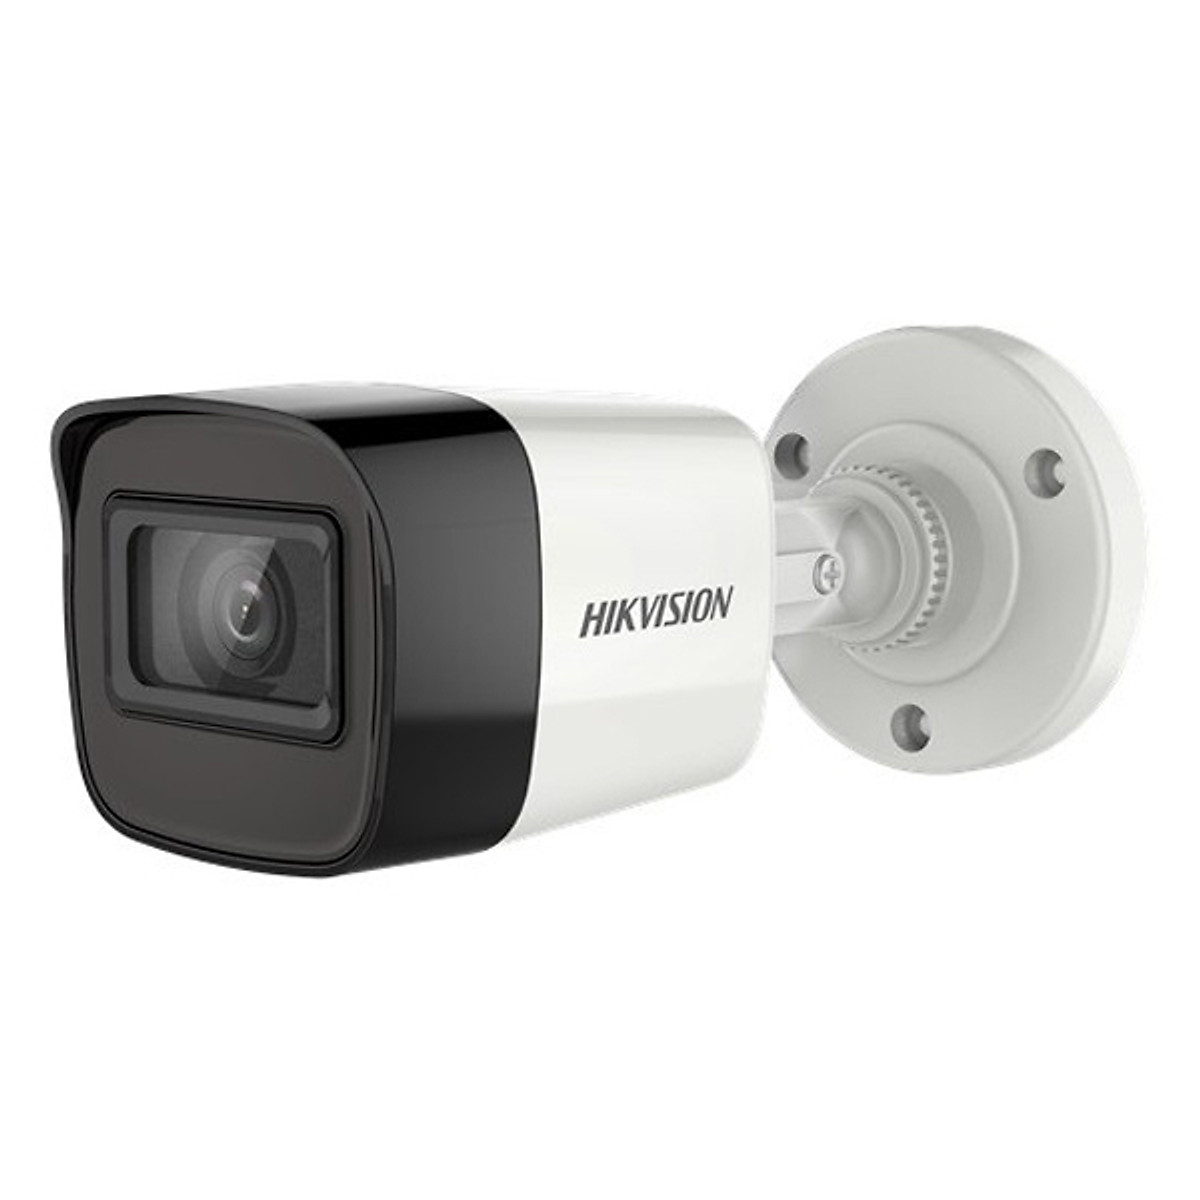 Camera Hikvision DS-2CE16D3T-ITPF – Hàng Nhập Khẩu